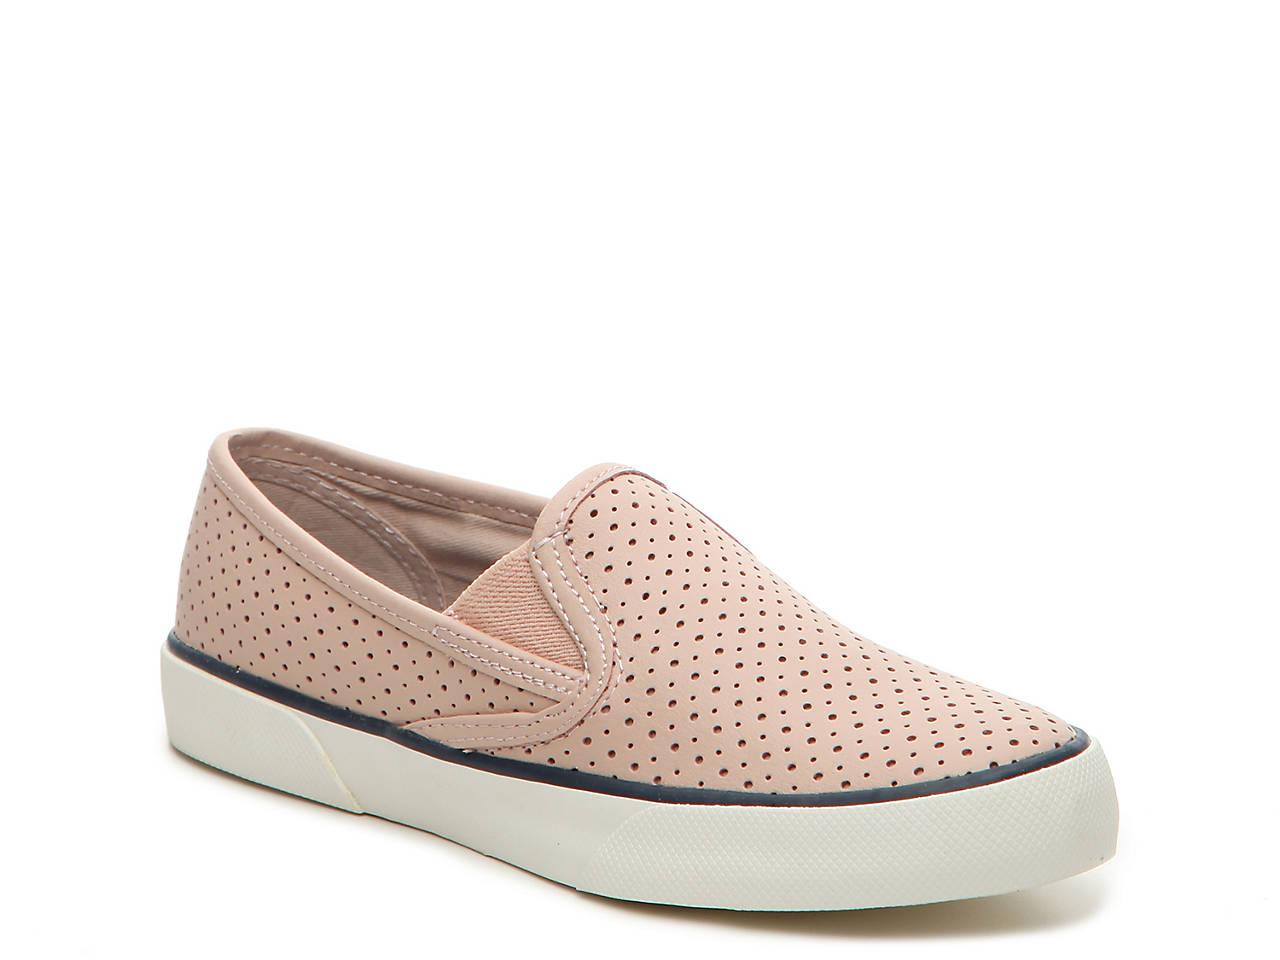 Sperry Top-Sider Pier Side Slip-On Sneaker Women s Shoes  cb77b1e4d